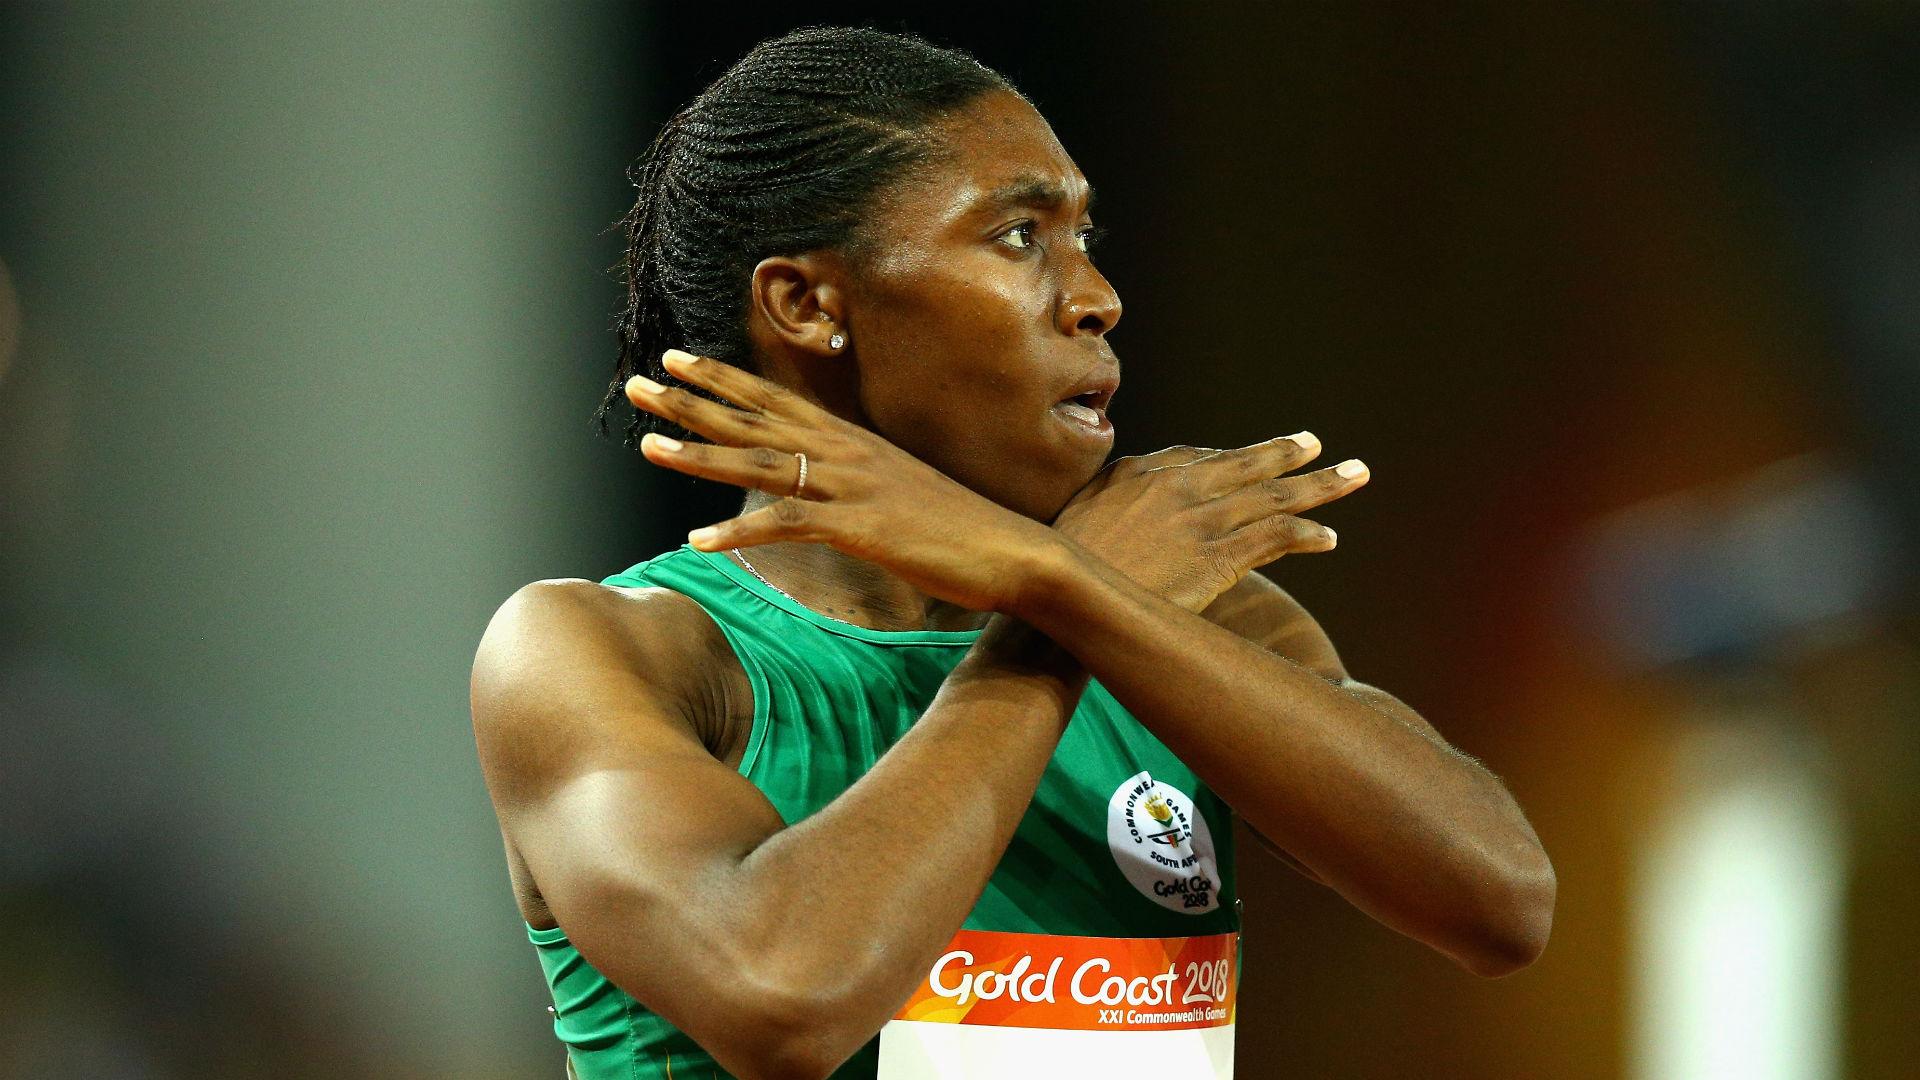 Semenya criticises IAAF testing following release of CAS award